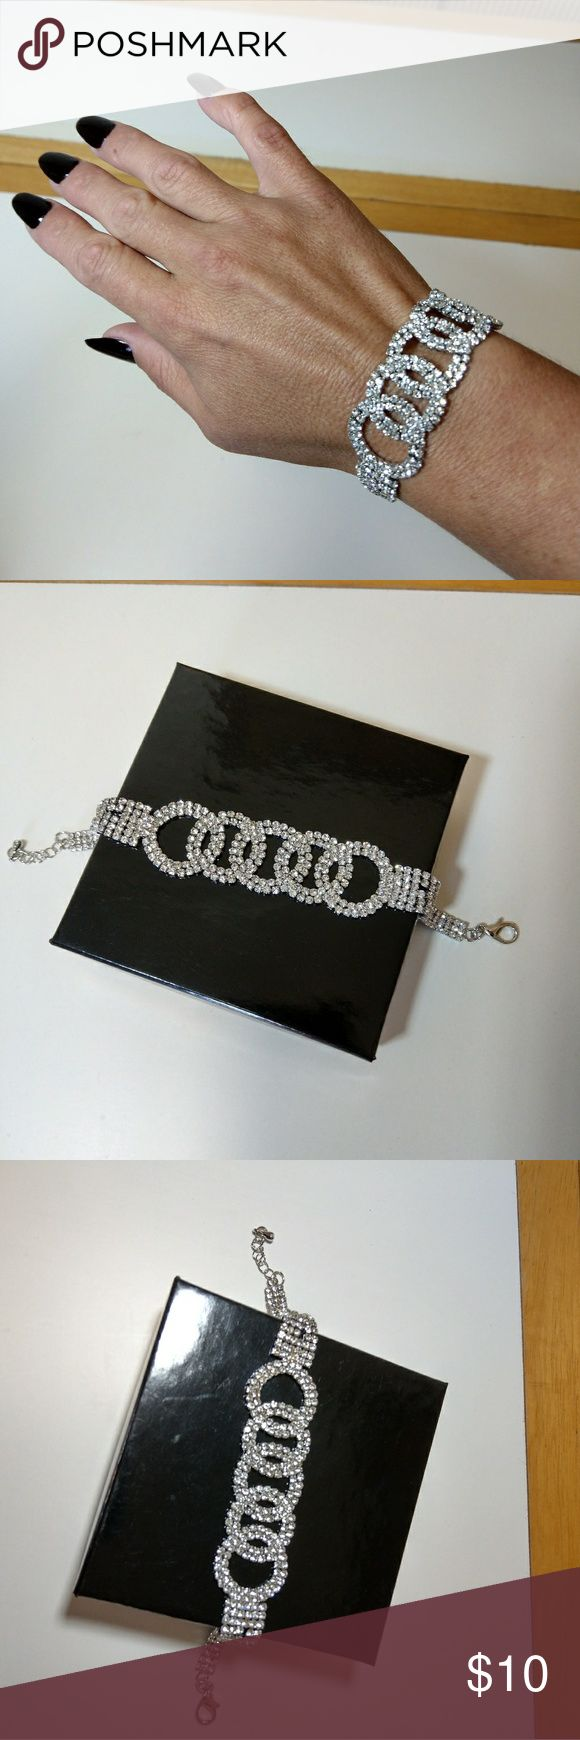 NWOT Diamond look eternity bracelet!! NWOT!! Beautiful diamond look eternity bracelet!! Can adjust size with hook!!! Great for a fancy event!!!flexible mesh material!! Jewelry Bracelets